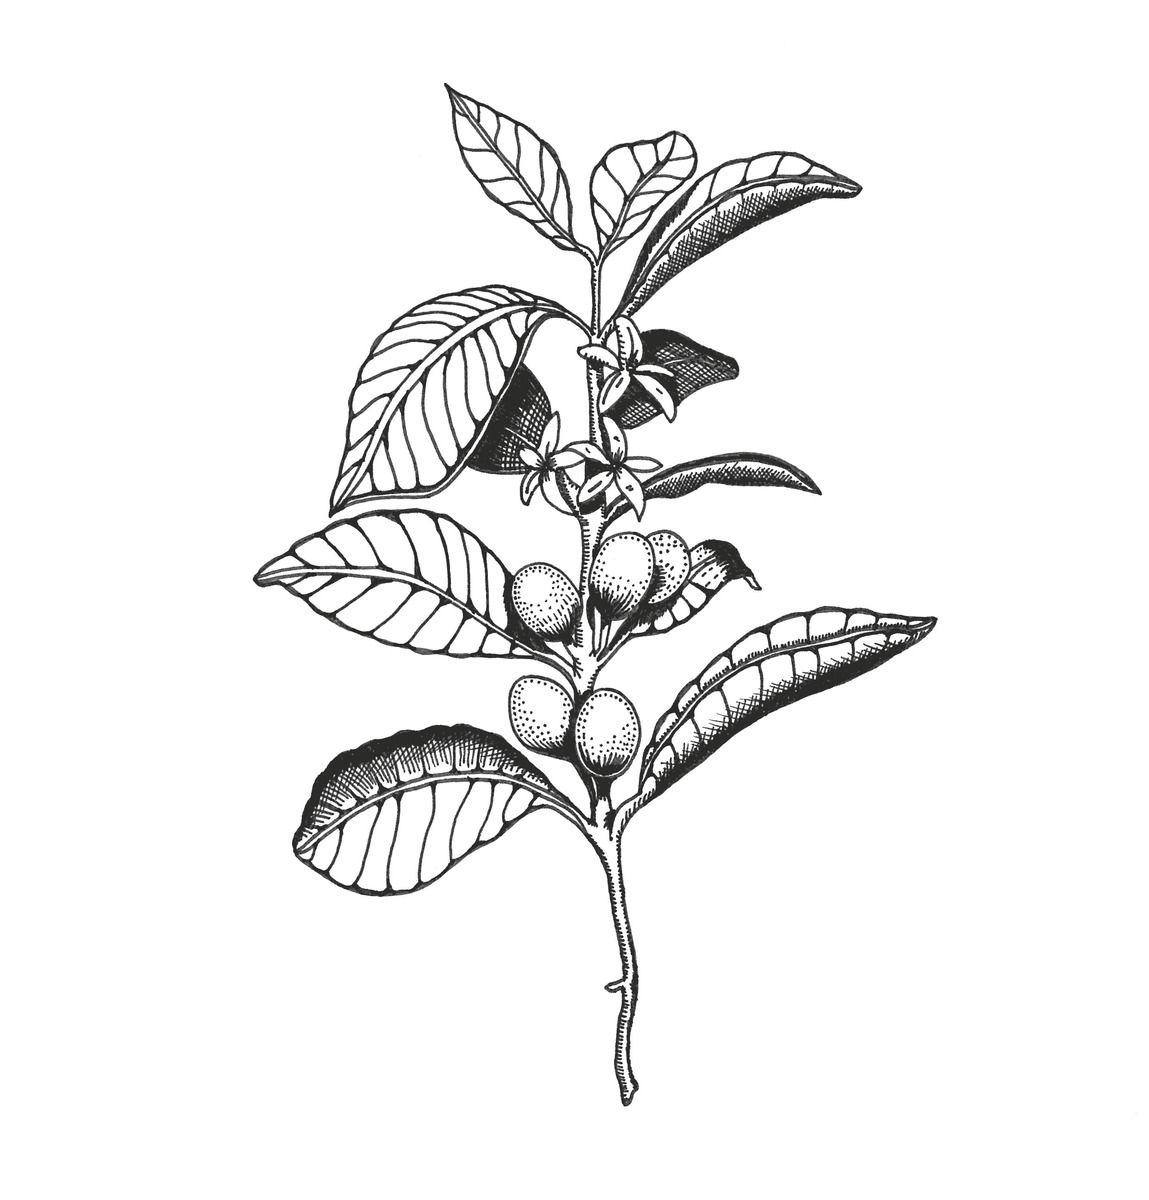 Pin By Alicia Harding On Tattoos Pinterest Tattoos Plant Tattoo